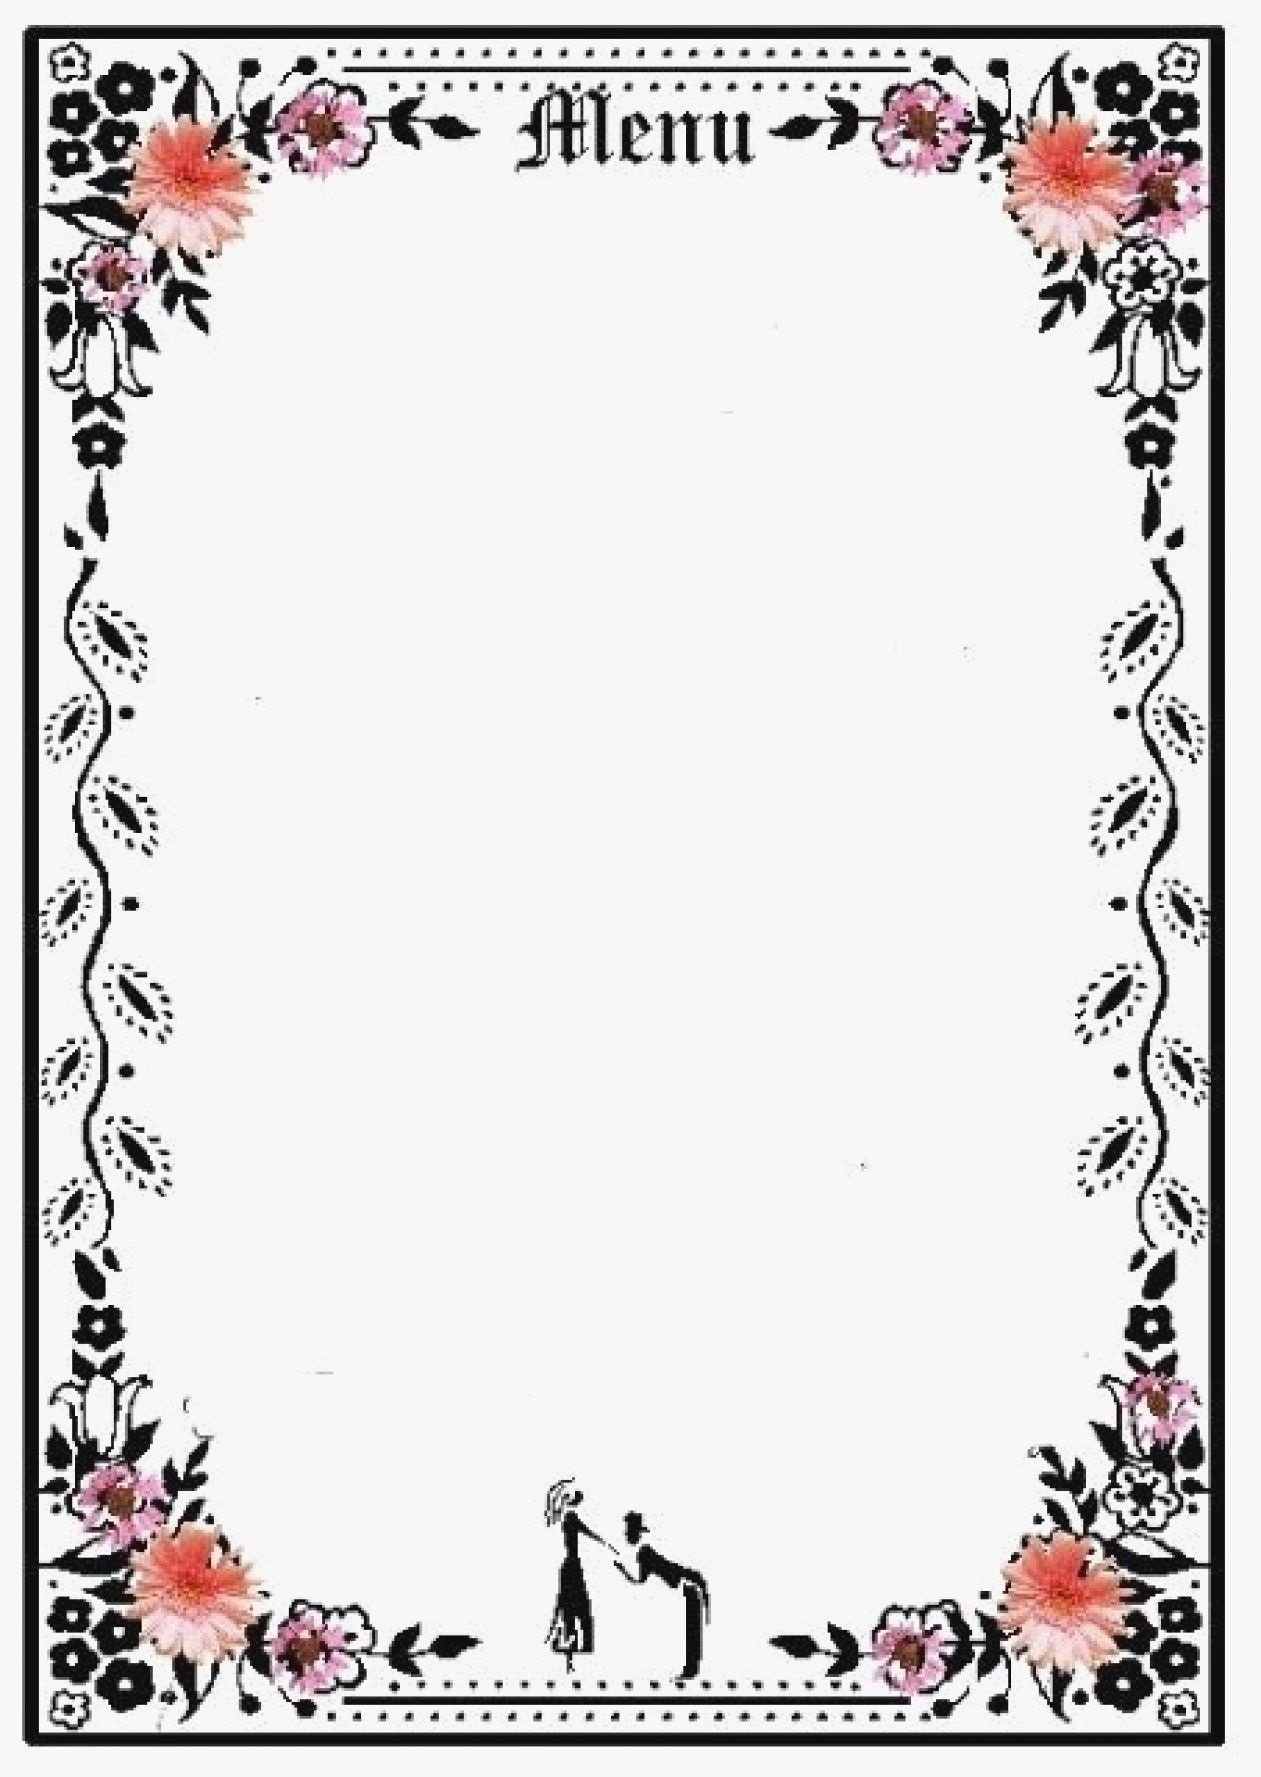 003 Wonderful Blank Restaurant Menu Template Example  Free Printable DownloadableFull